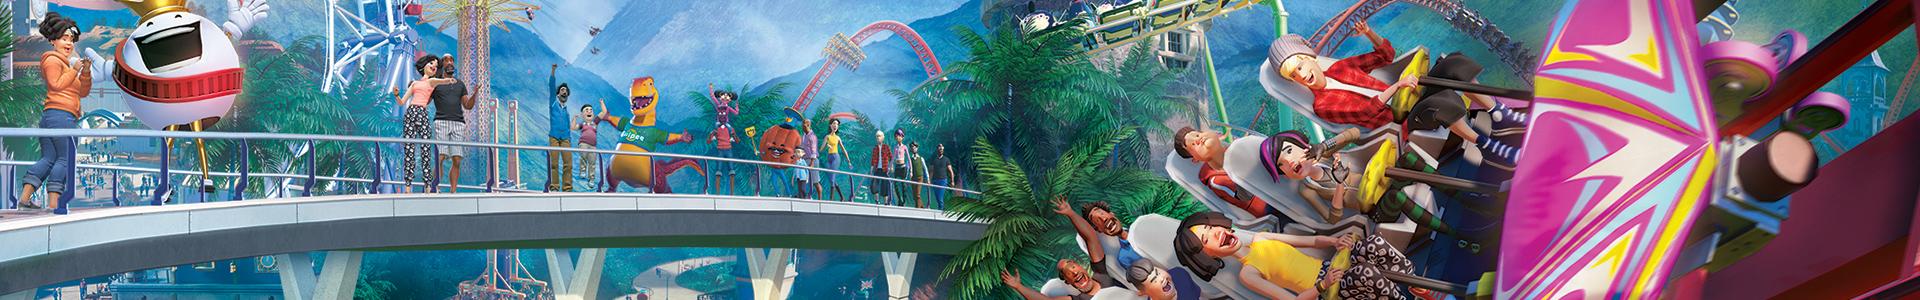 planet-coaster-banner